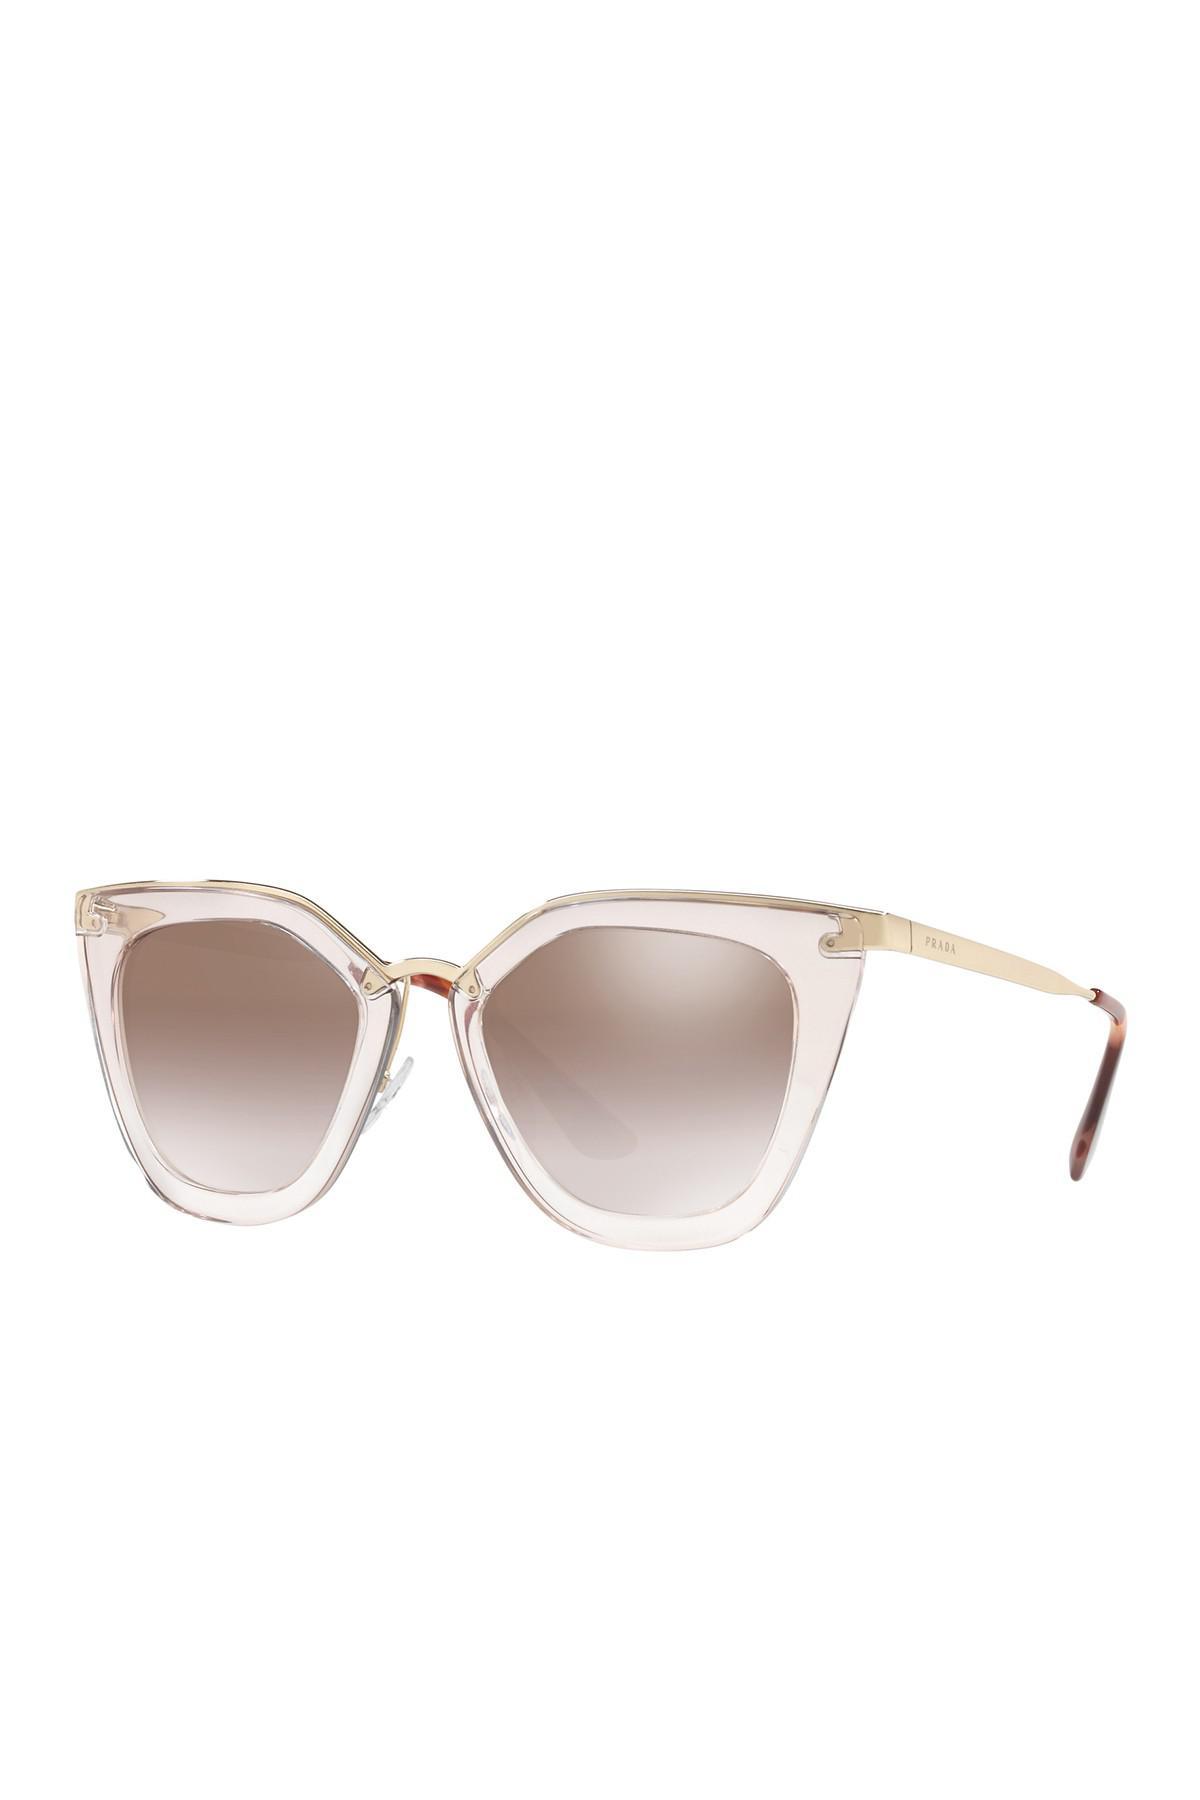 4d6223b45a4f Lyst - Prada 52mm Retro Sunglasses